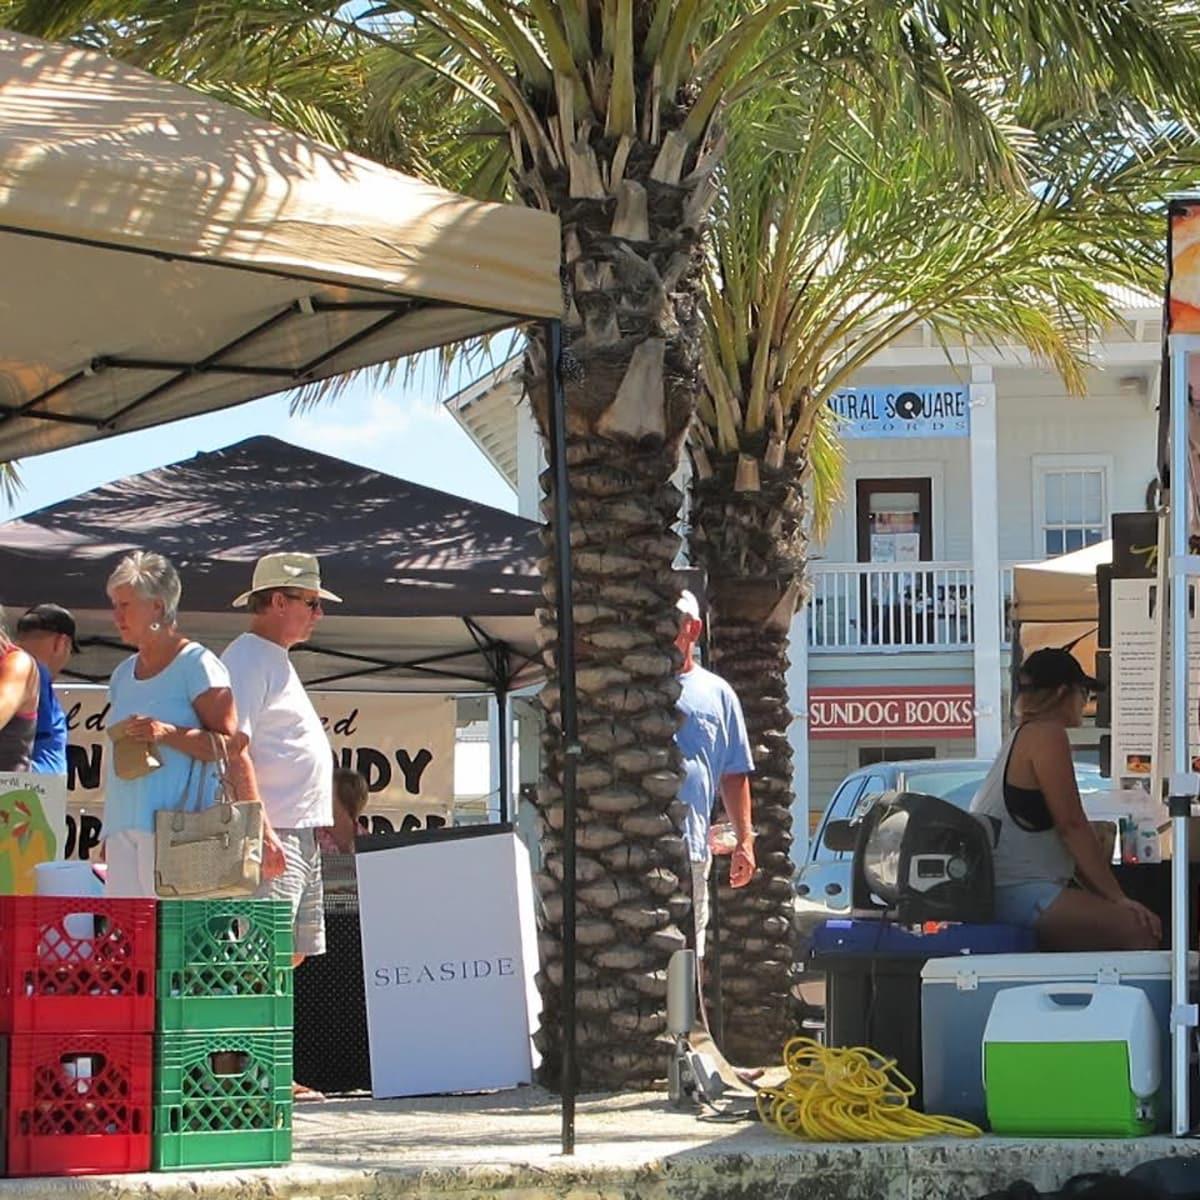 Seaside Florida farmers market